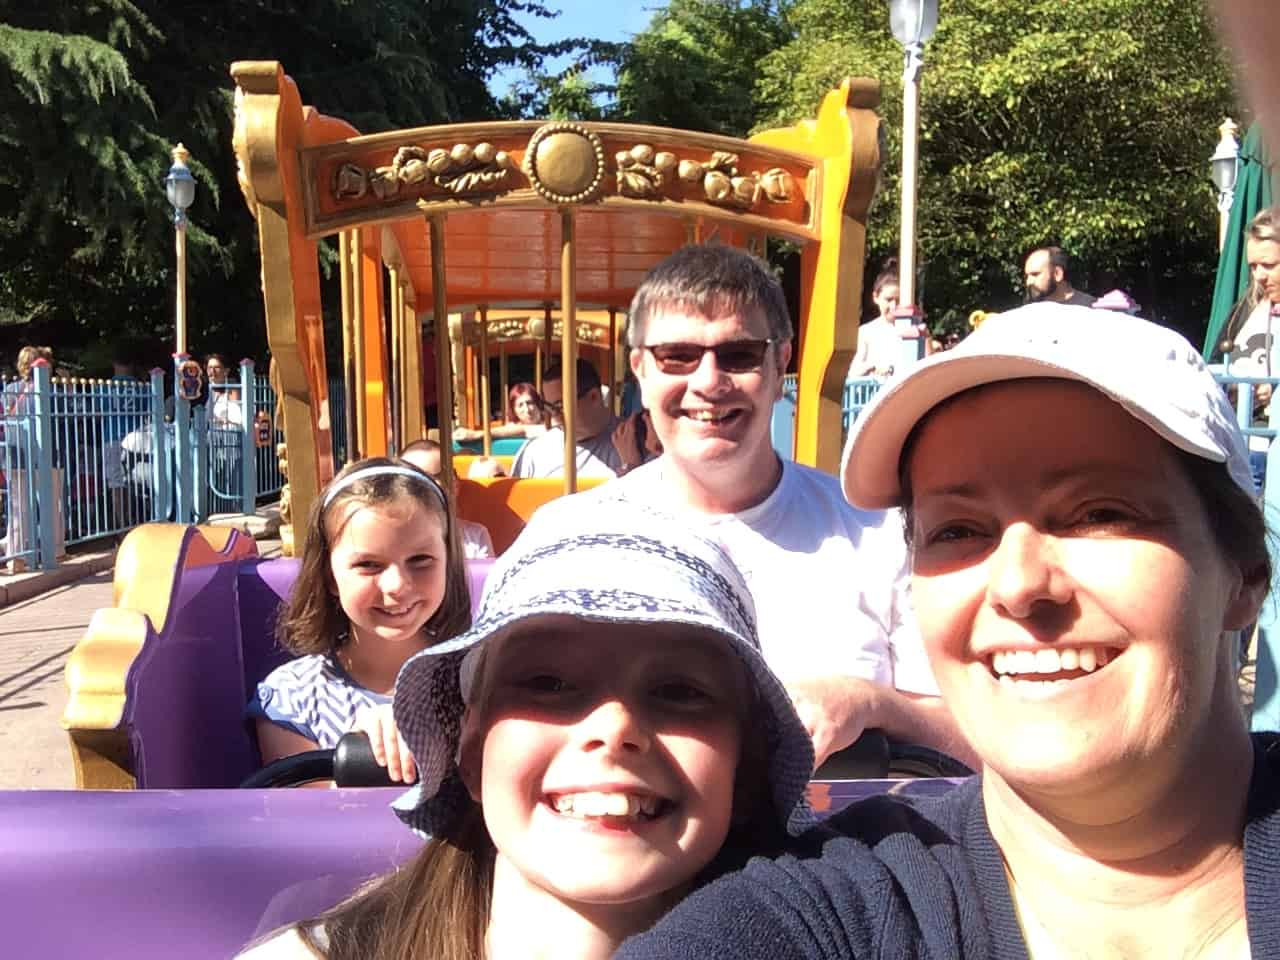 Disney - Dumbo's circus train